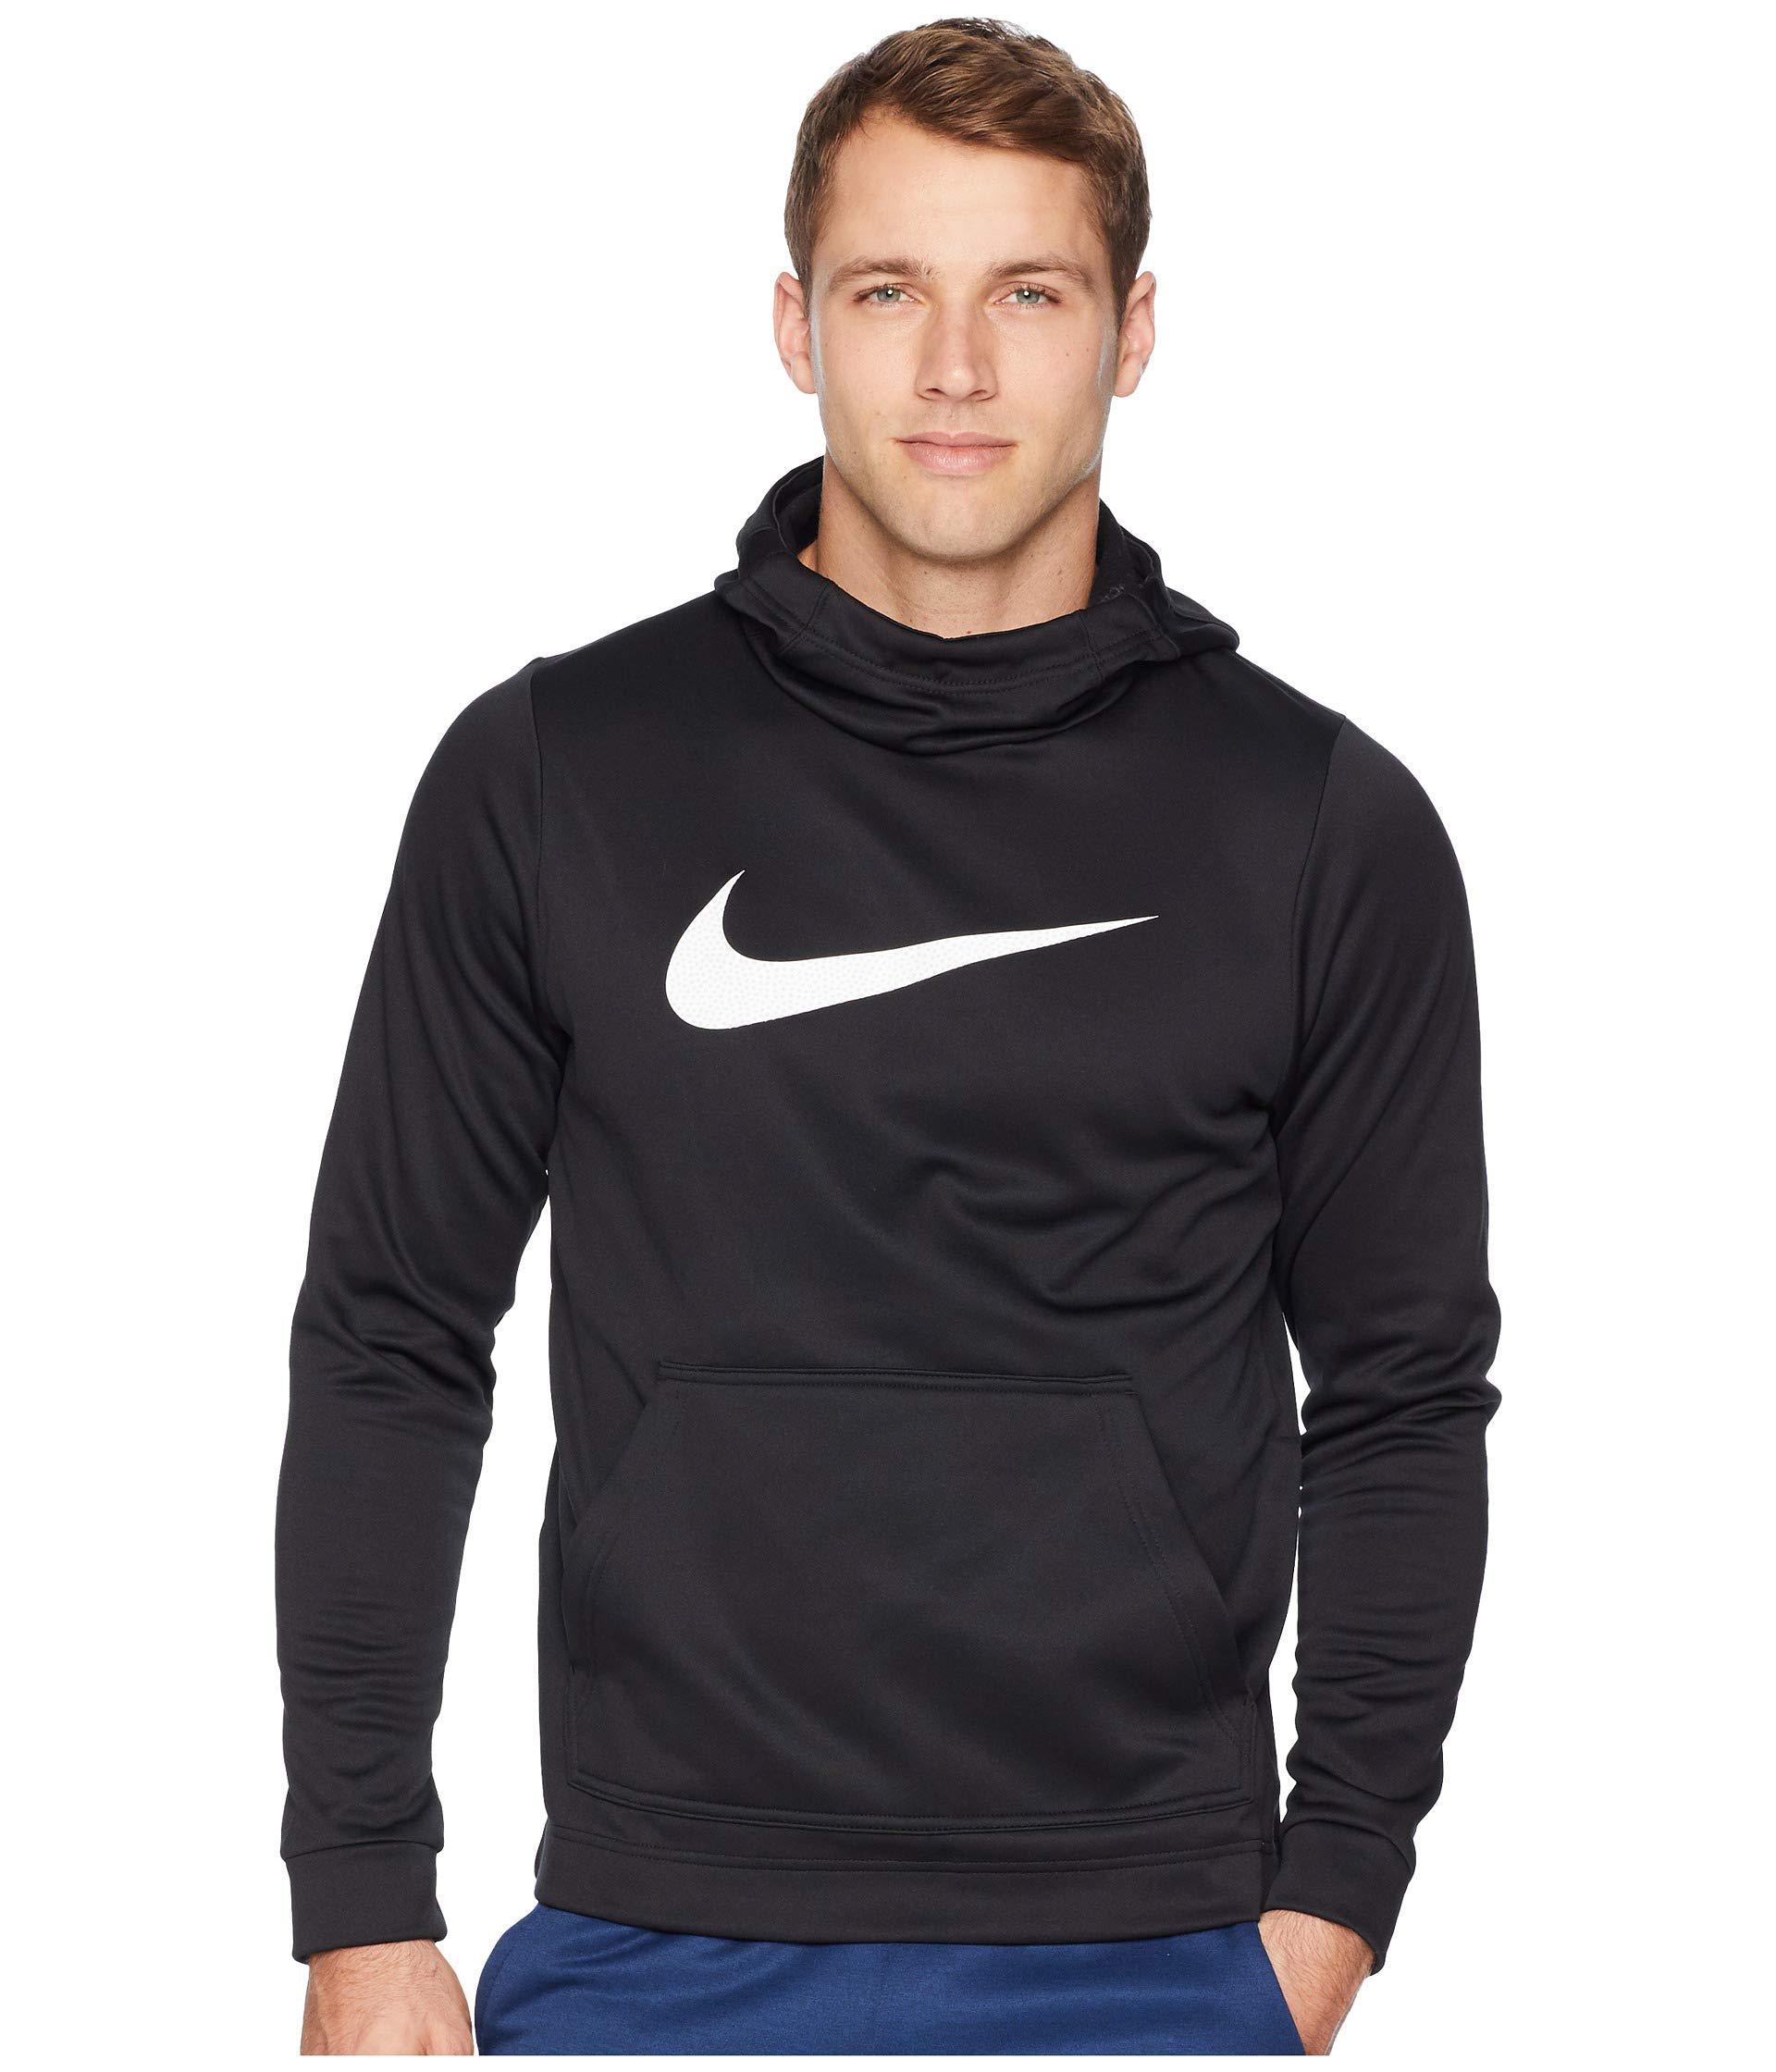 d65559b98d67 Lyst - Nike Therma Hybrid Pullover Hoodie (black white) Men s ...